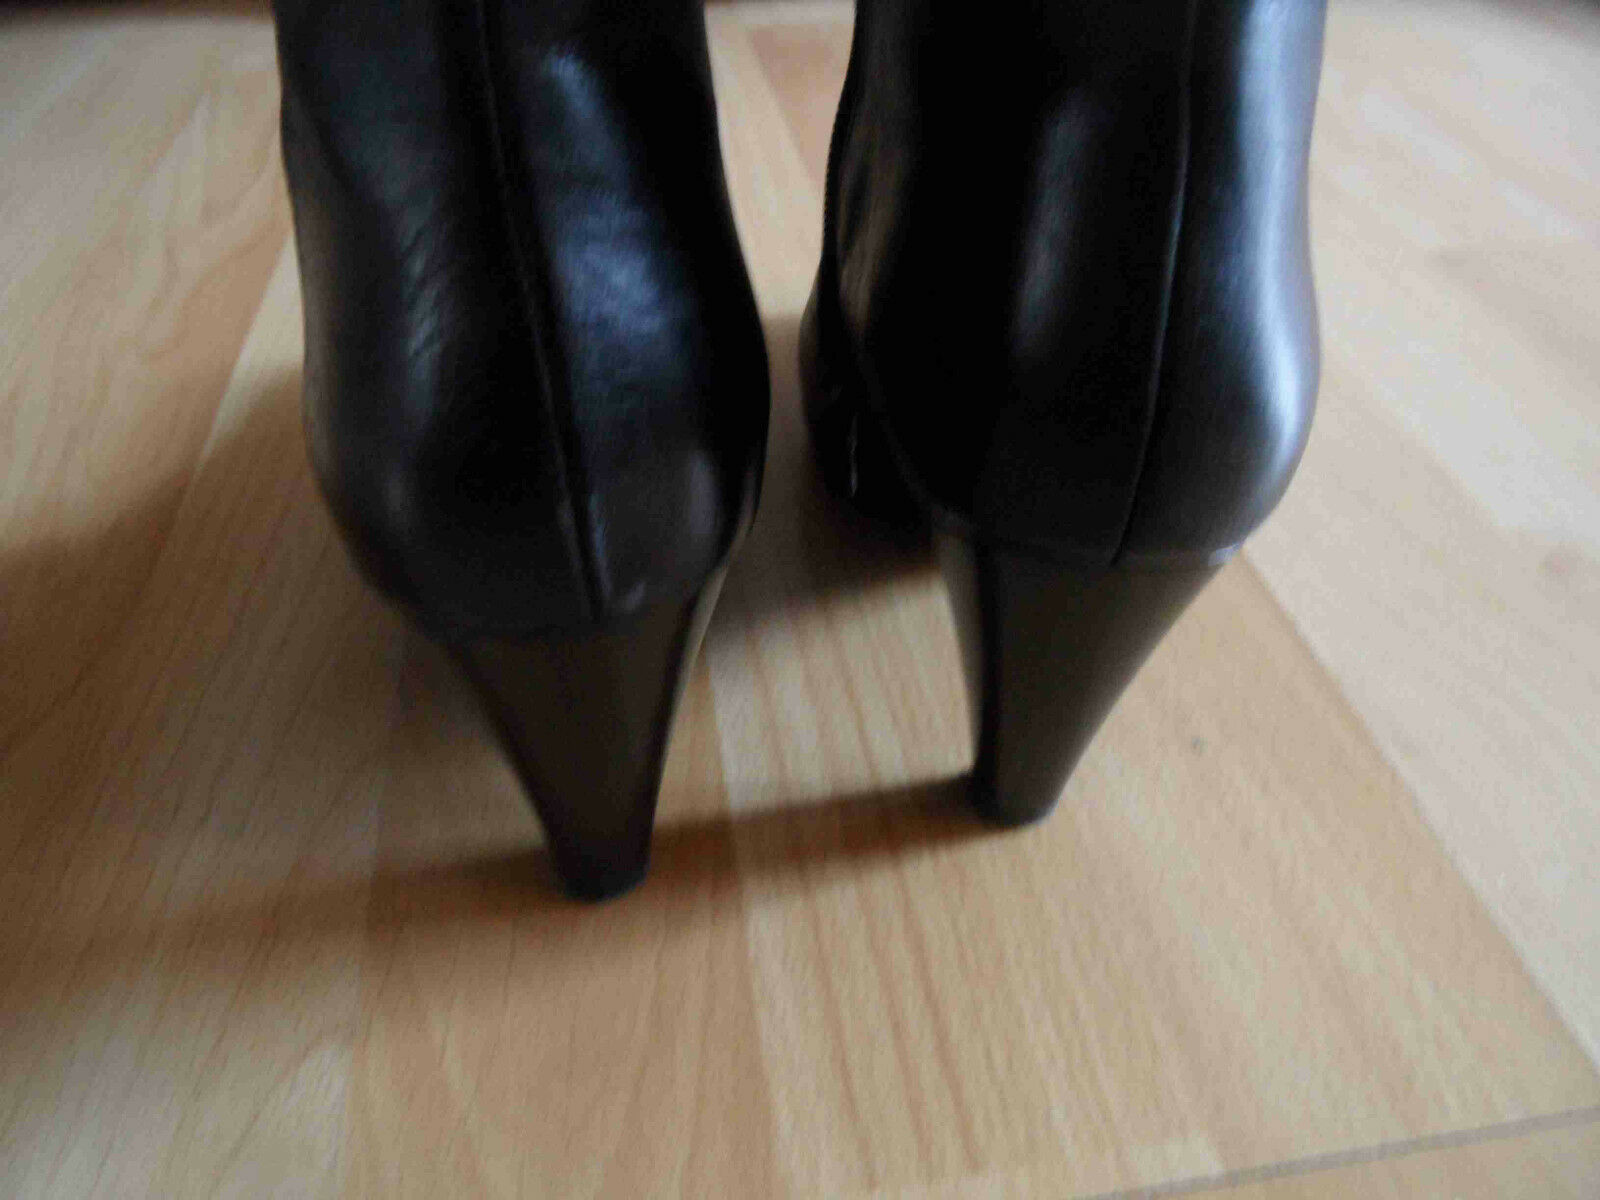 NERO GIARDINI GIARDINI GIARDINI chice hohe Stiefeletten schwarz Gr. 35 TOP OA 298b24